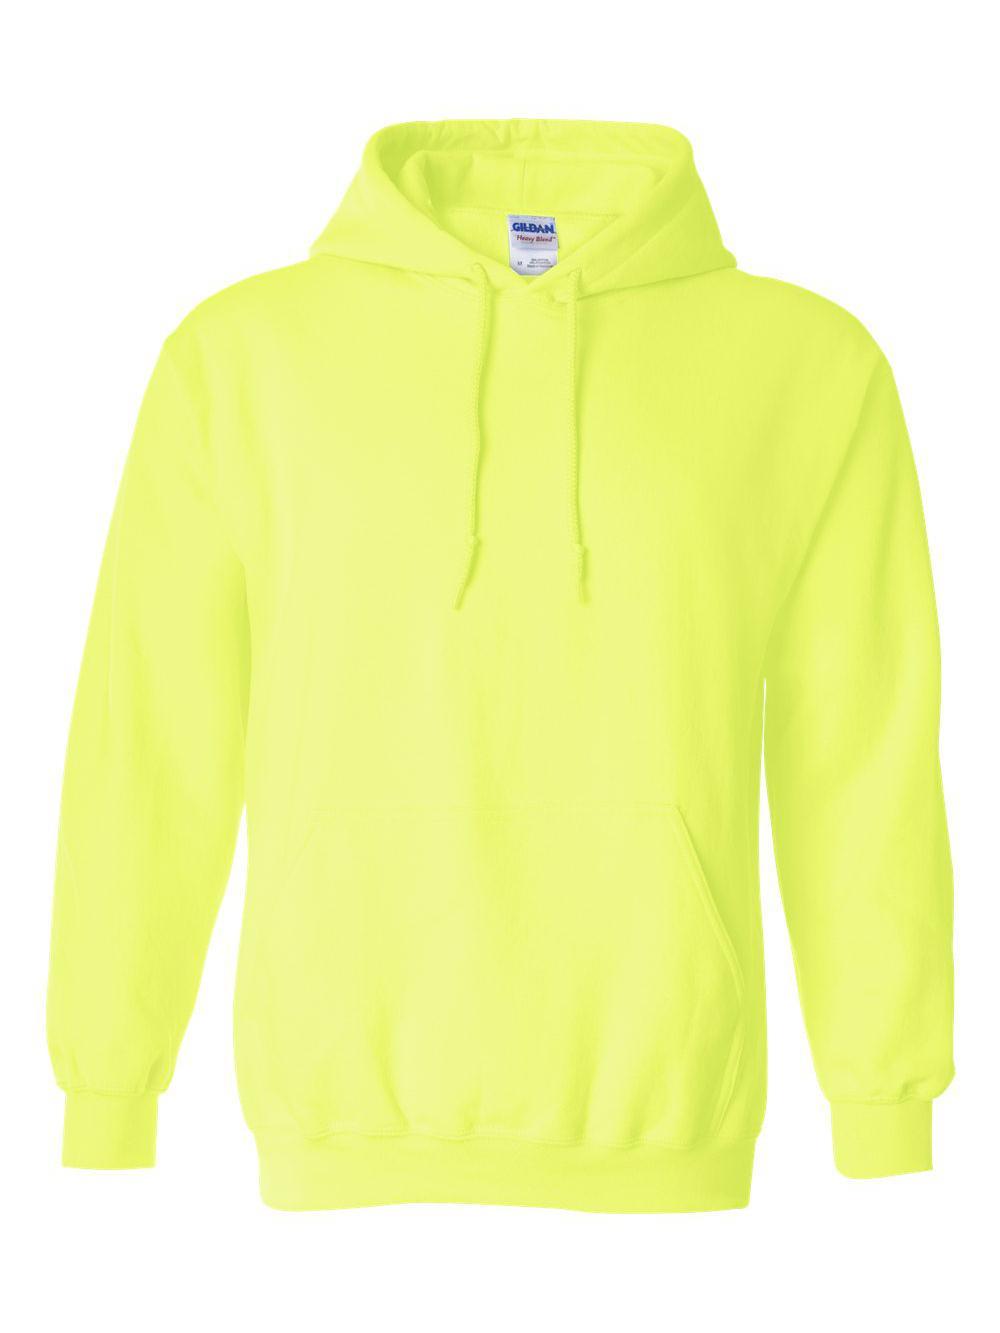 Gildan-Heavy-Blend-Hooded-Sweatshirt-18500 miniatura 99